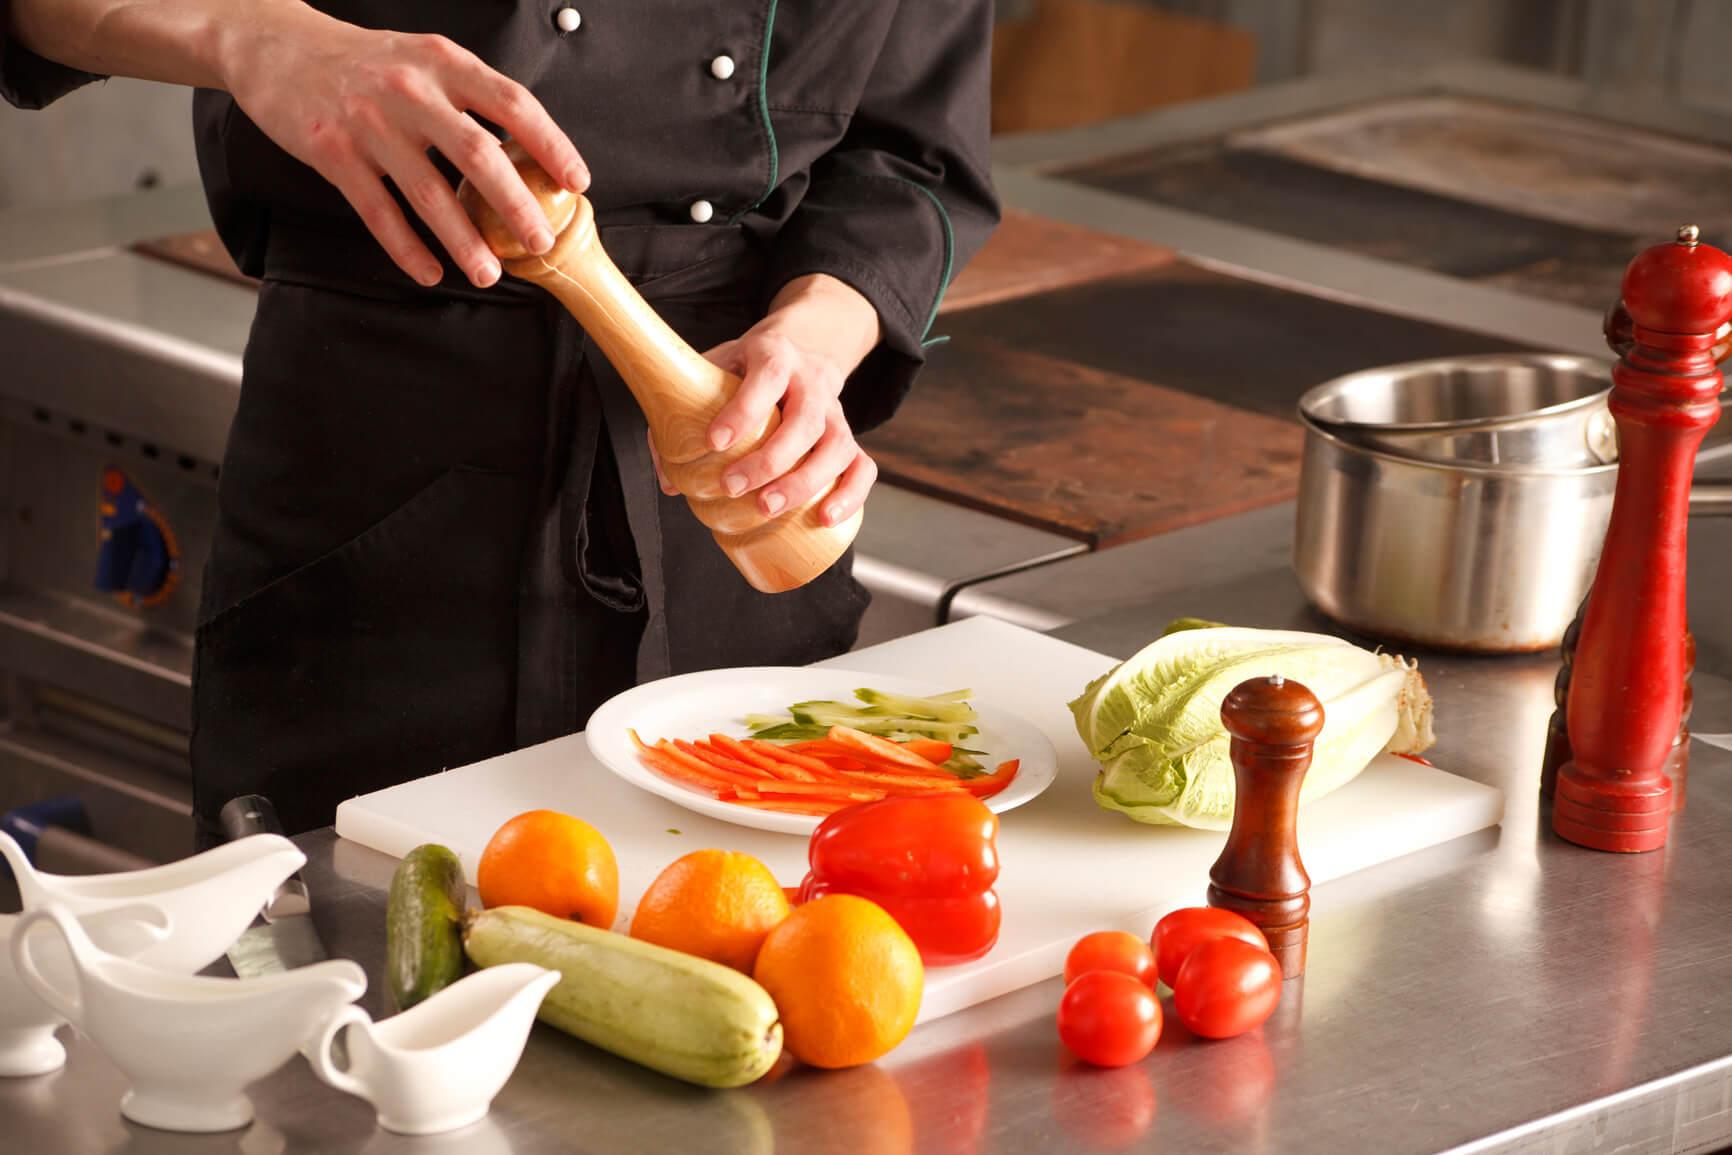 photodune-3851056-restaurant-kitchen-m